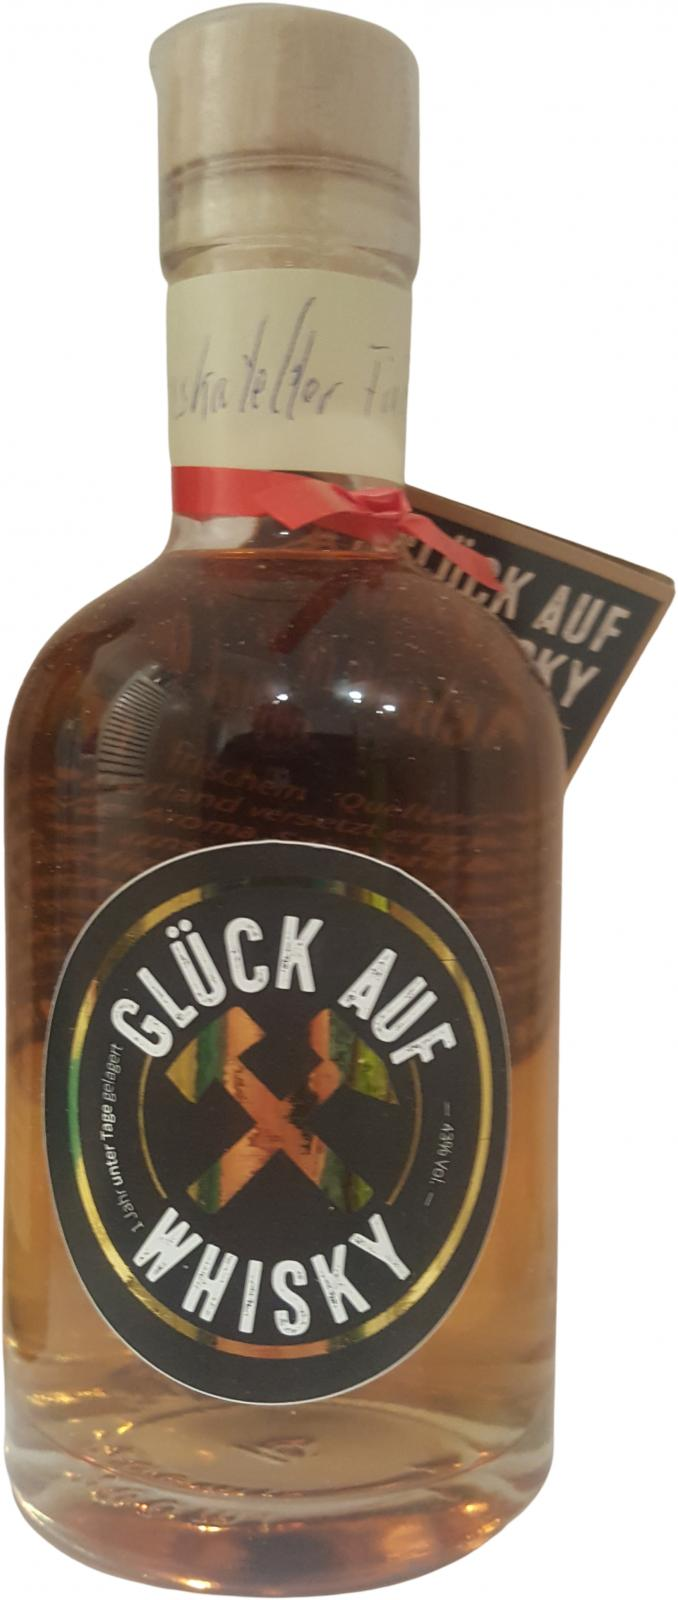 Glück Auf Whisky 04-year-old